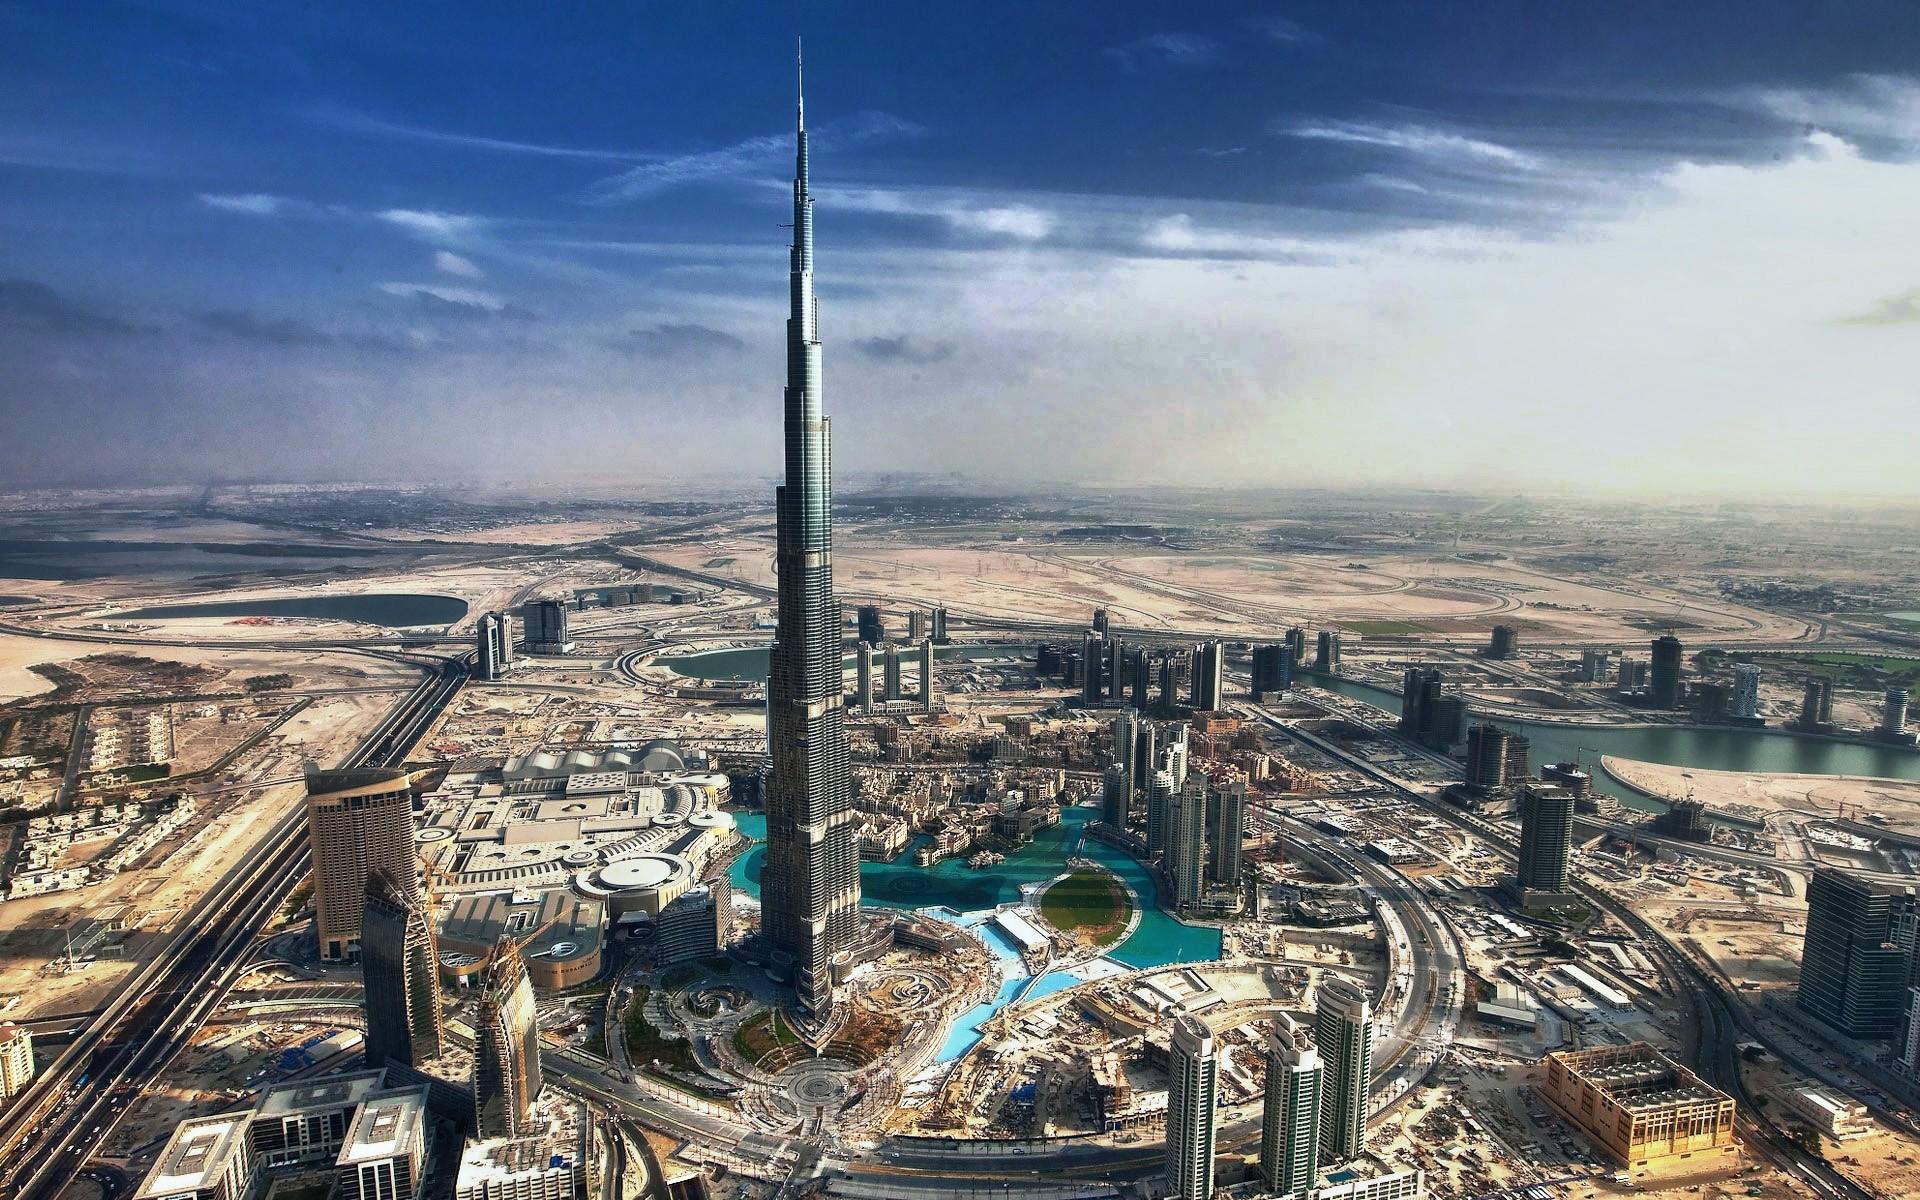 Dubai Wallpaper 1920x1200 Cityscapes Dubai Skyscrapers Burj Dubai 1920x1200